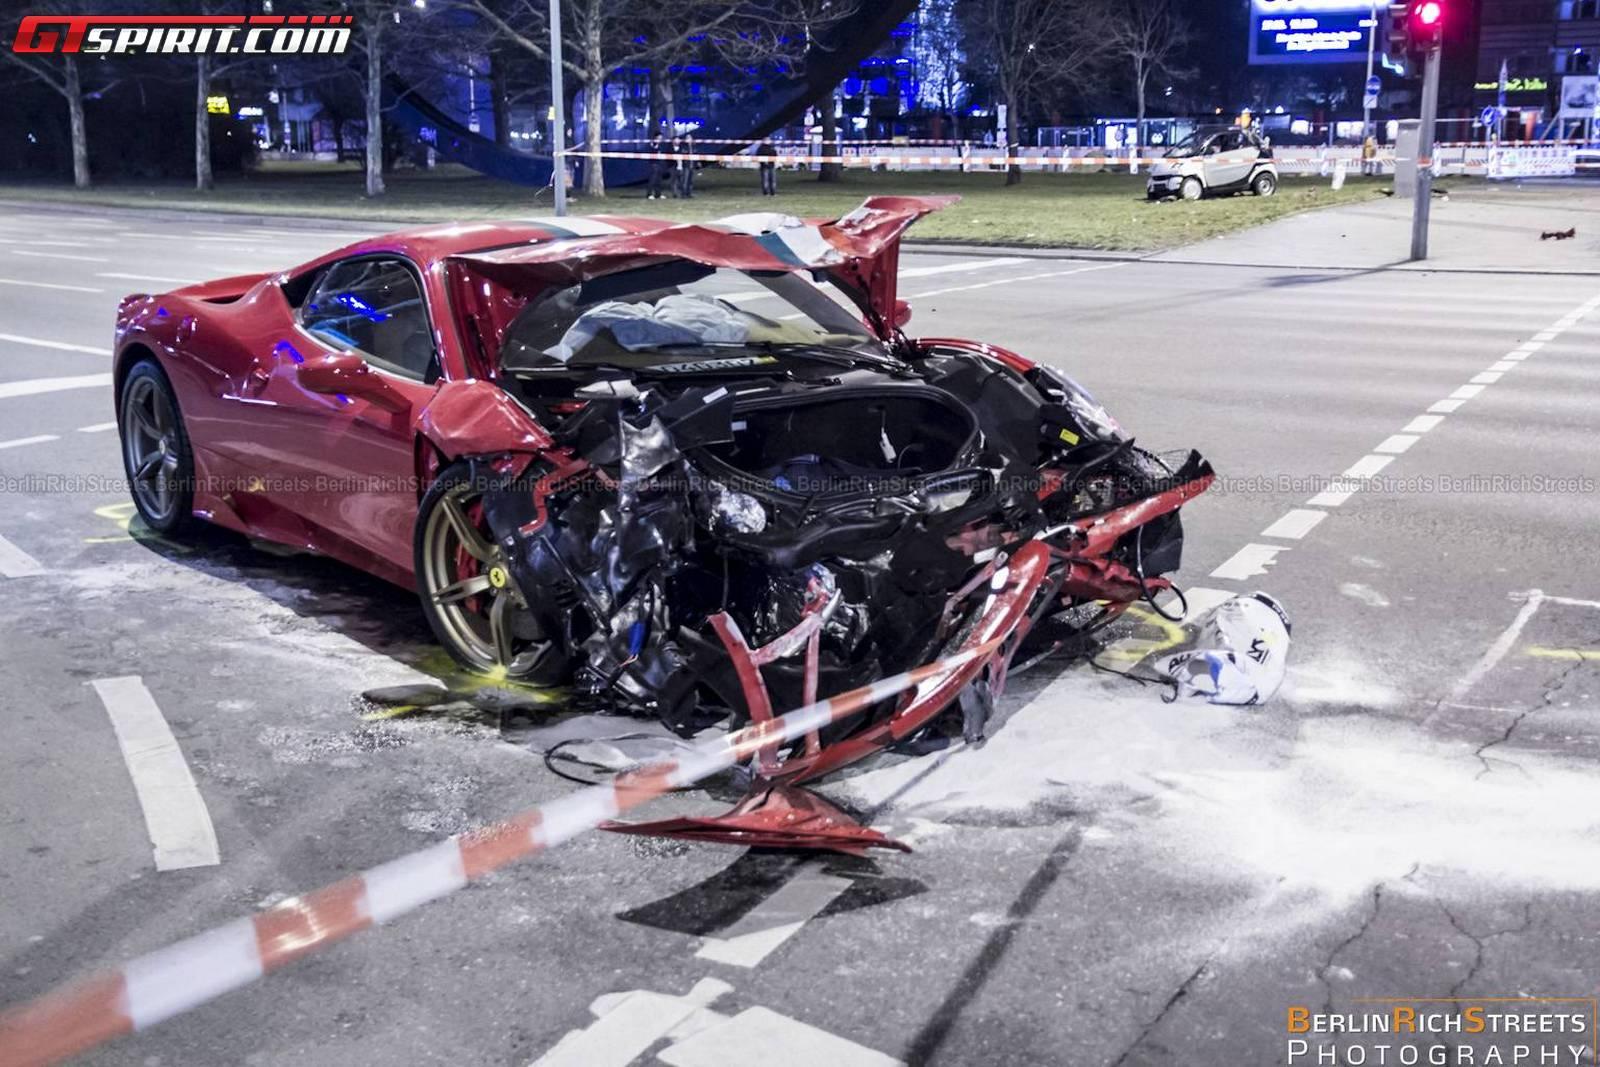 Smart Car Getting Hit By Semi